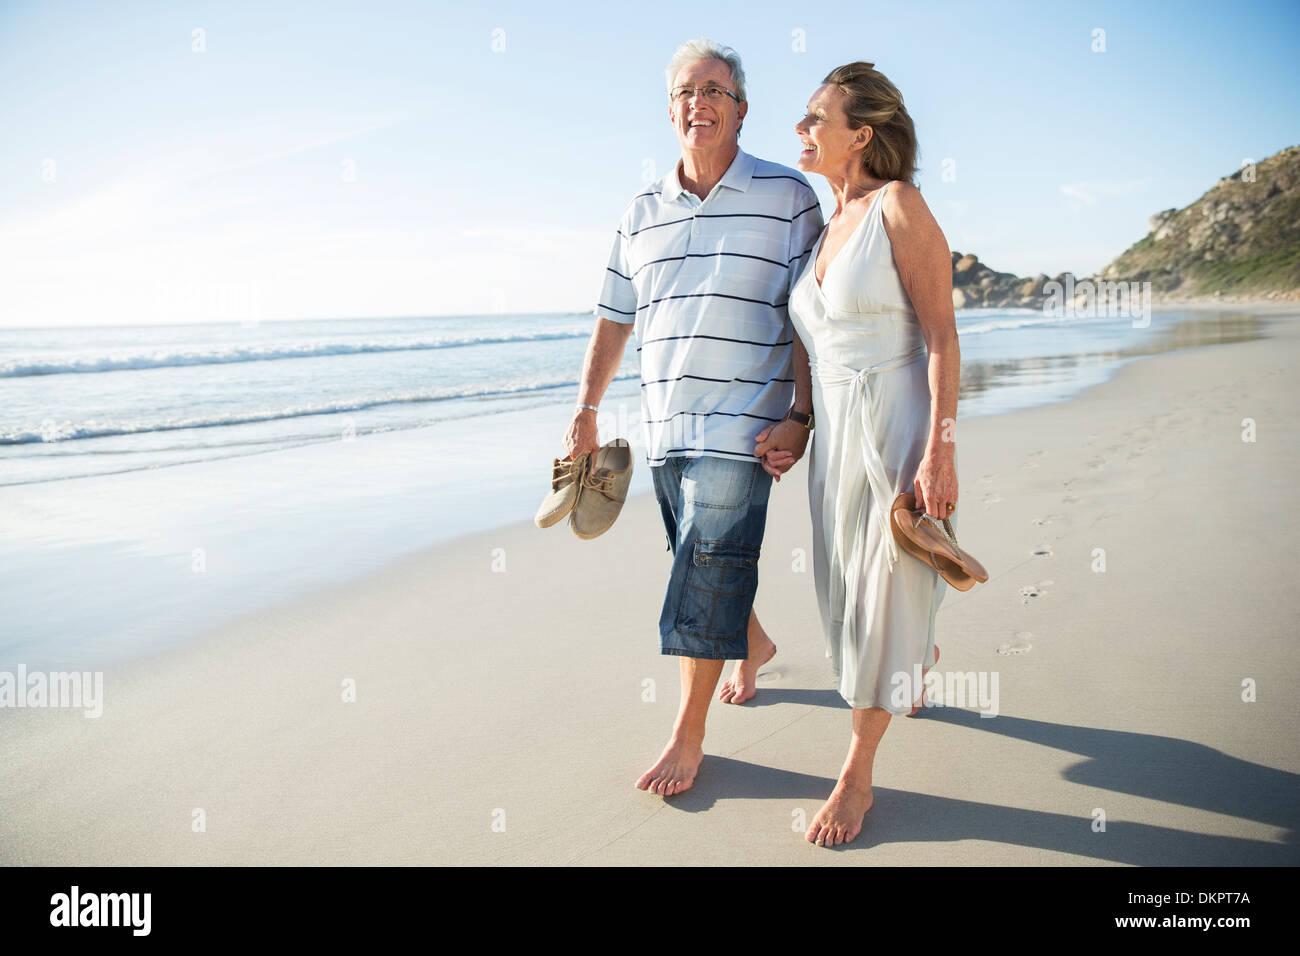 Senior couple walking on beach - Stock Image